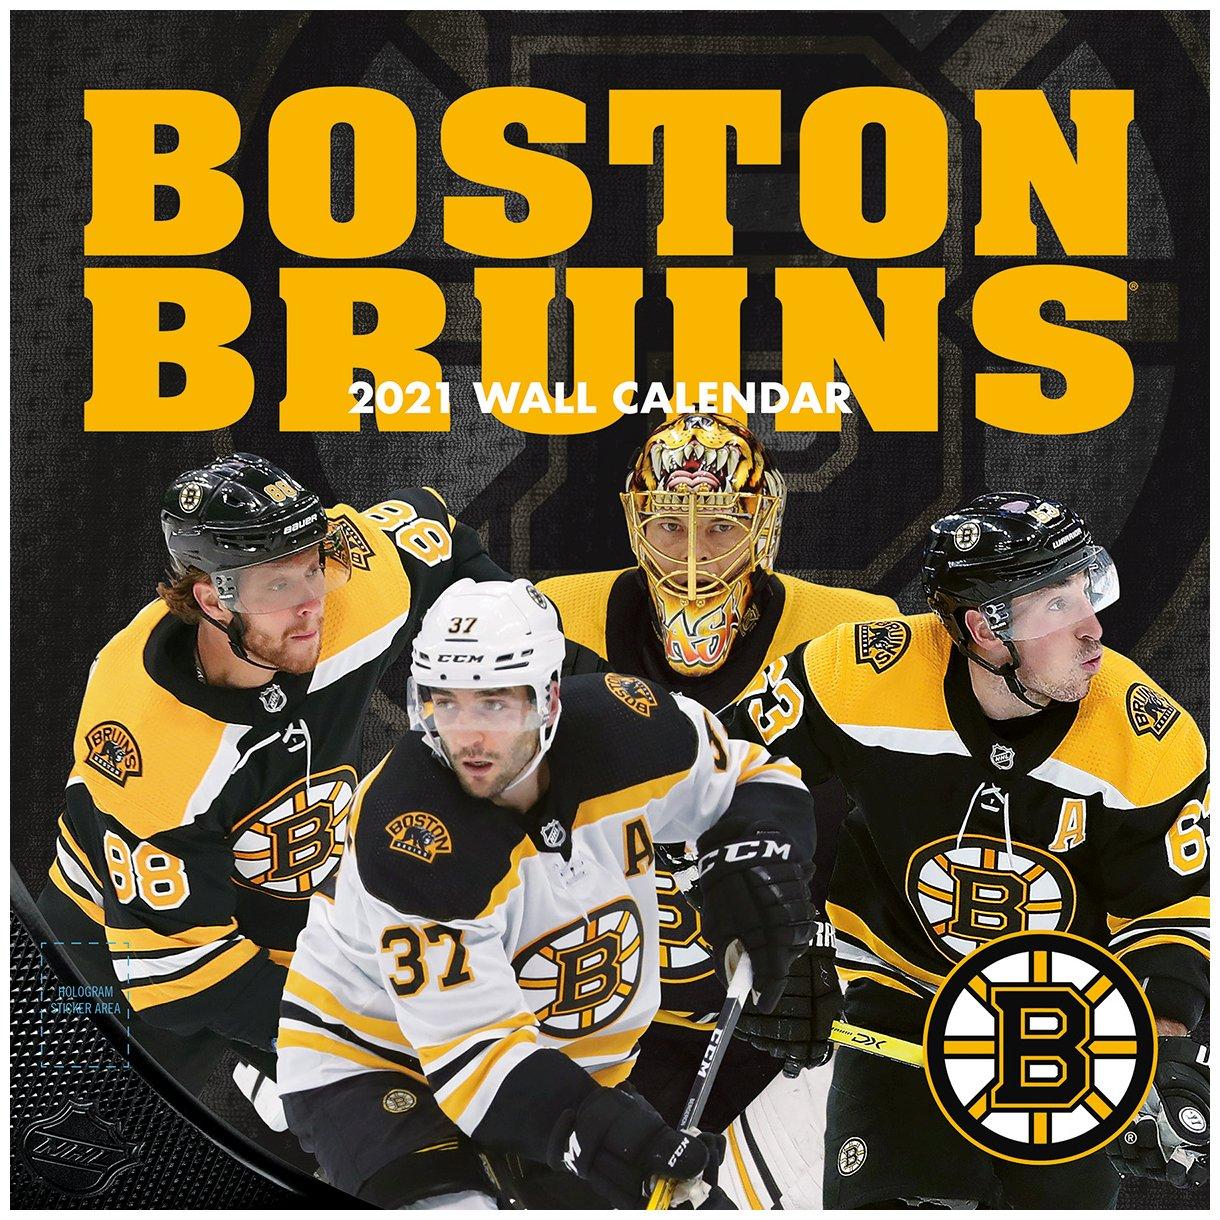 Boston 2021